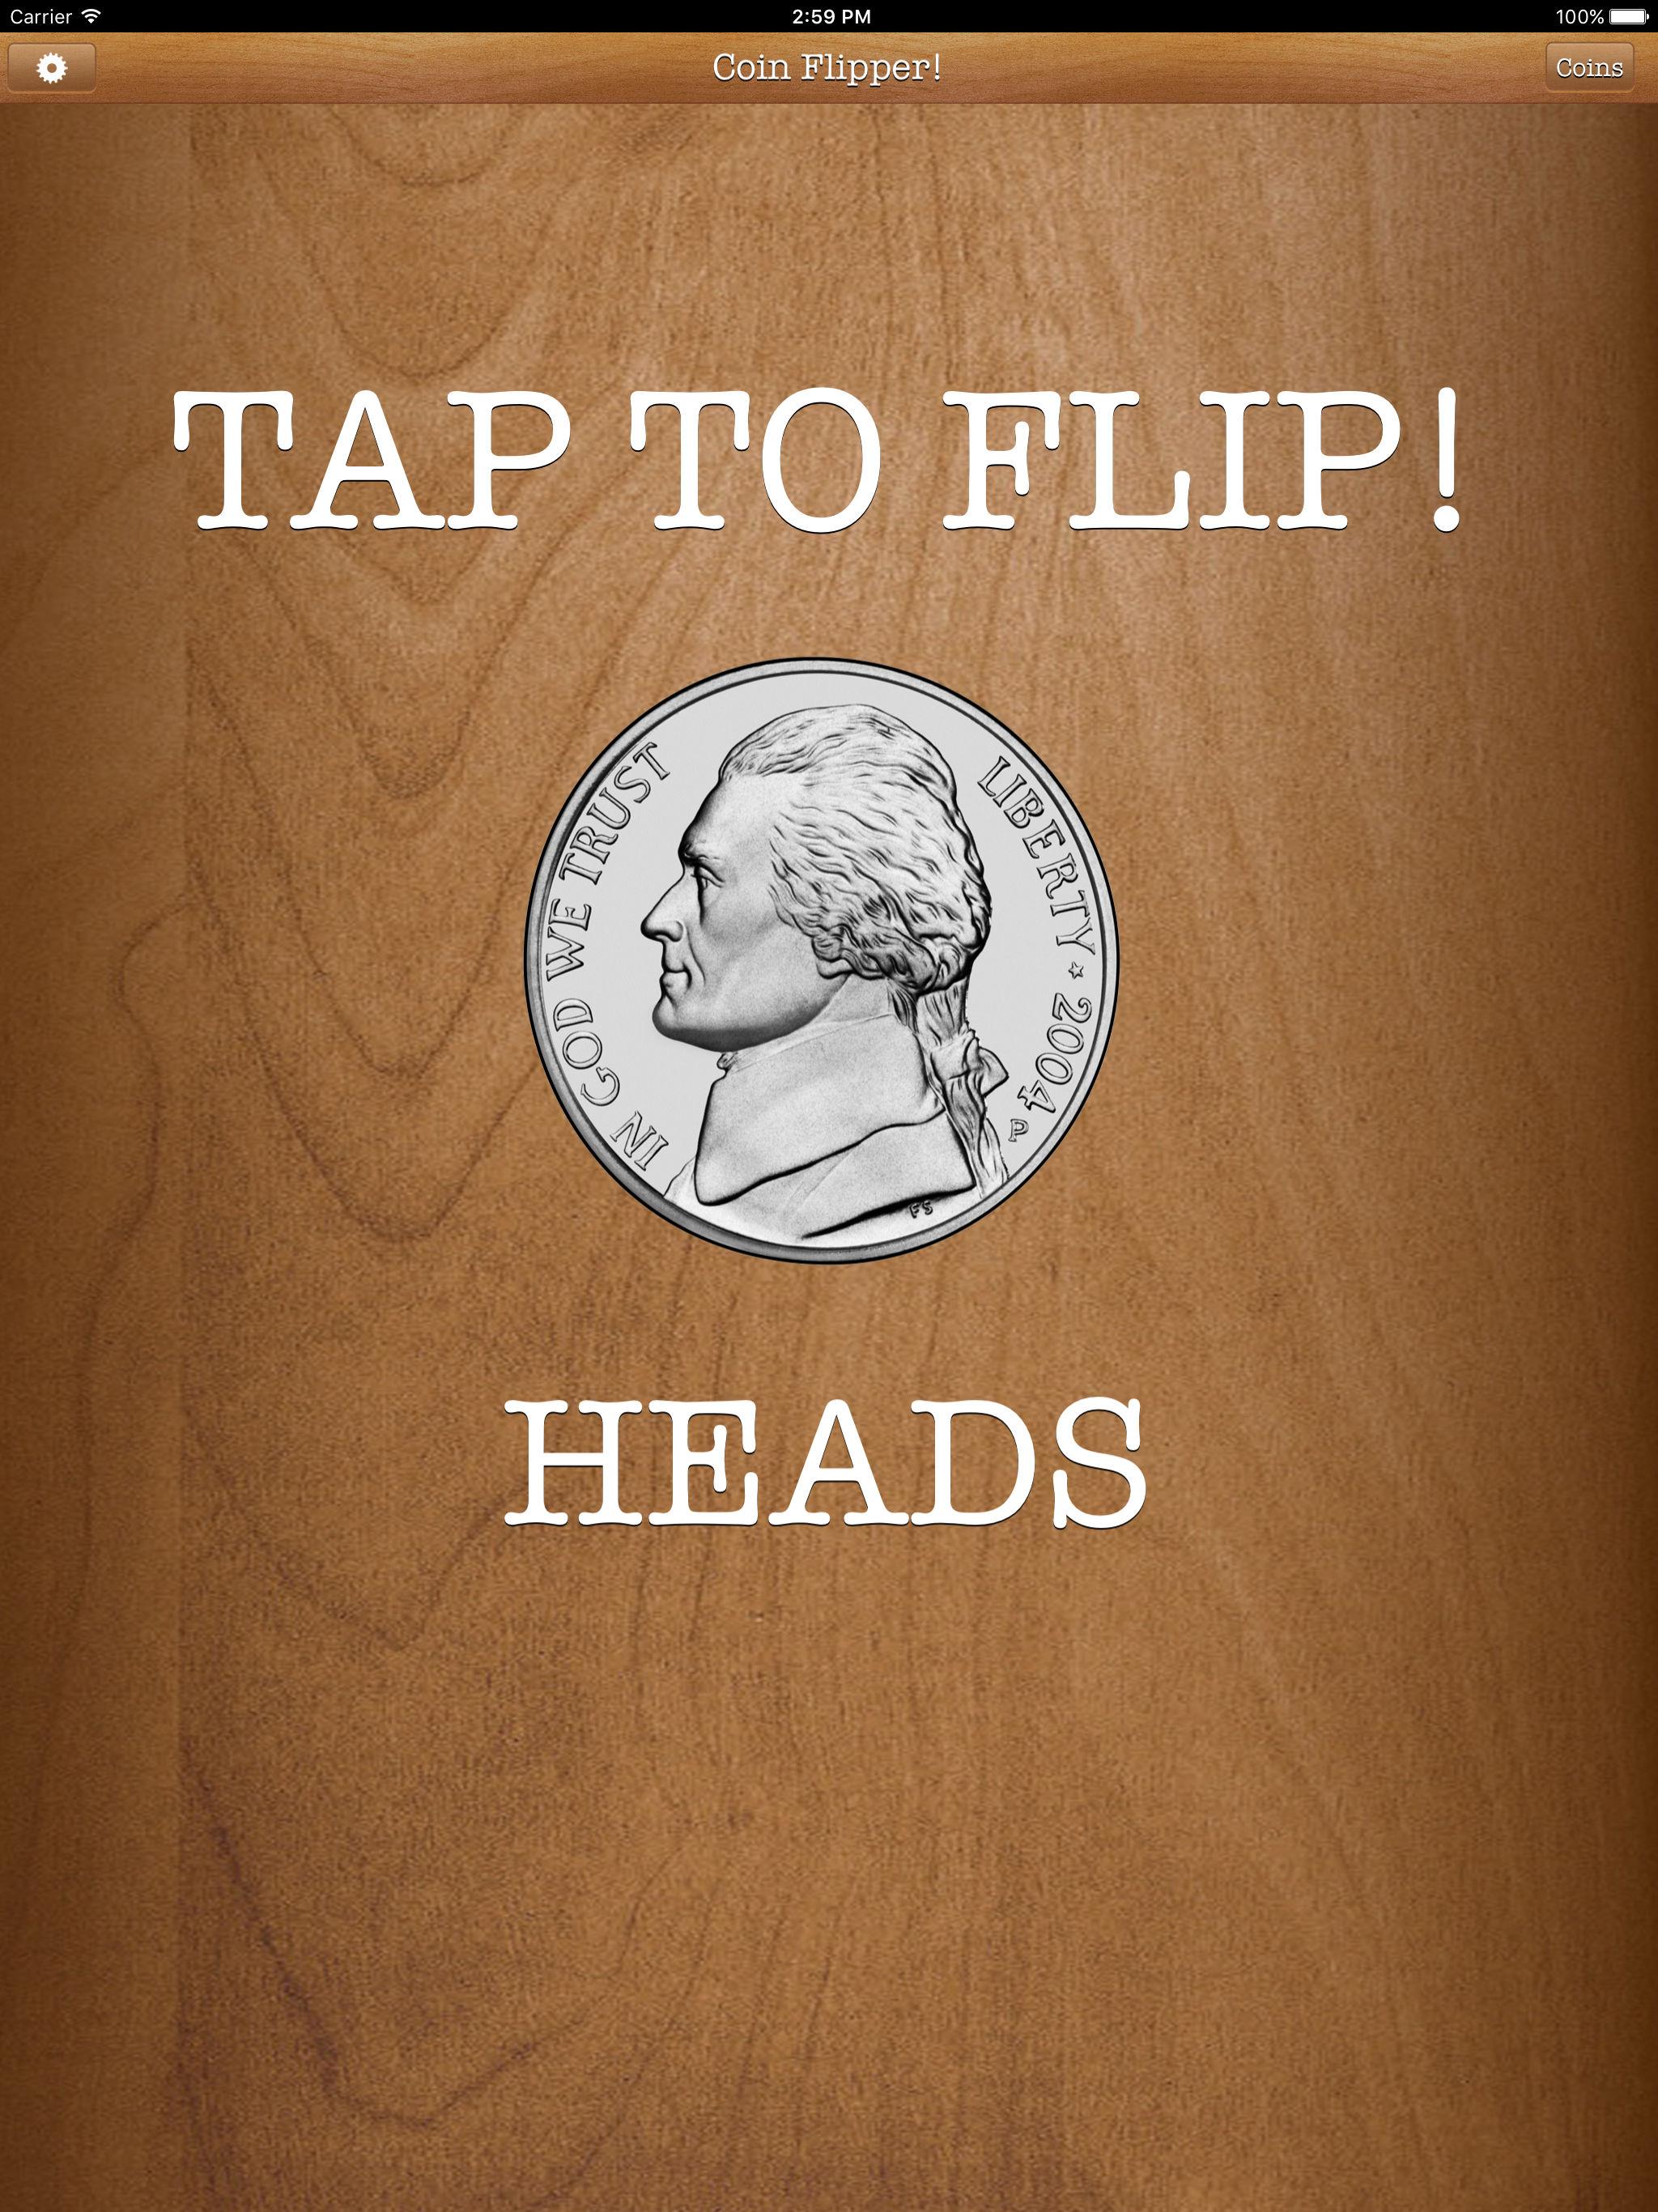 Flip a Coin App nickel on heads iPad Pro screenshot.